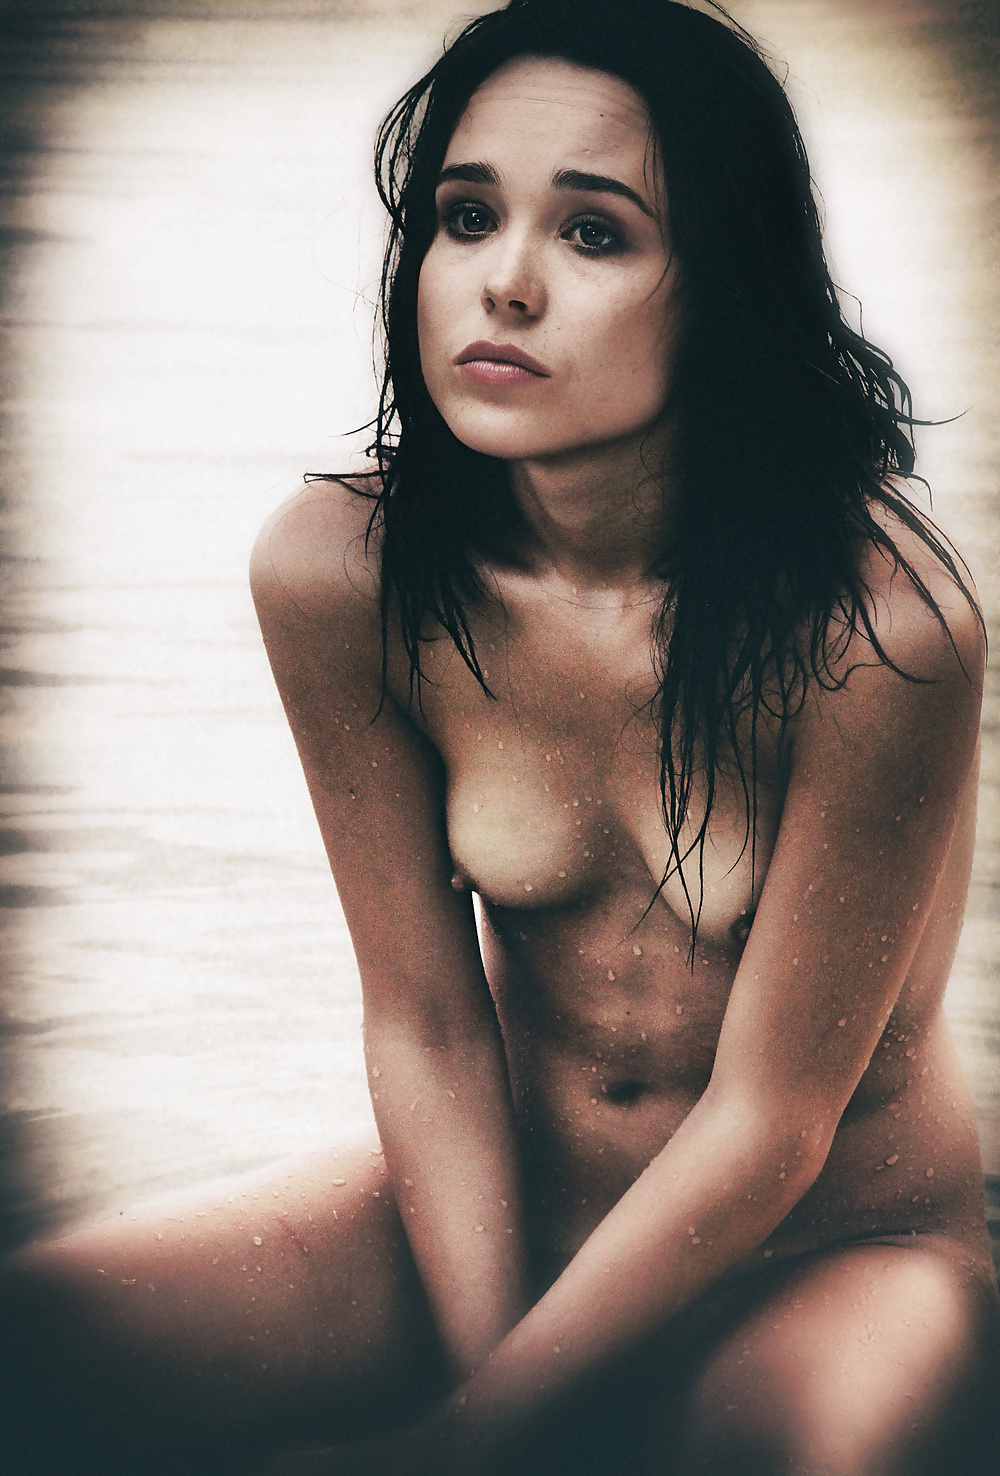 shannon-woodward-nude